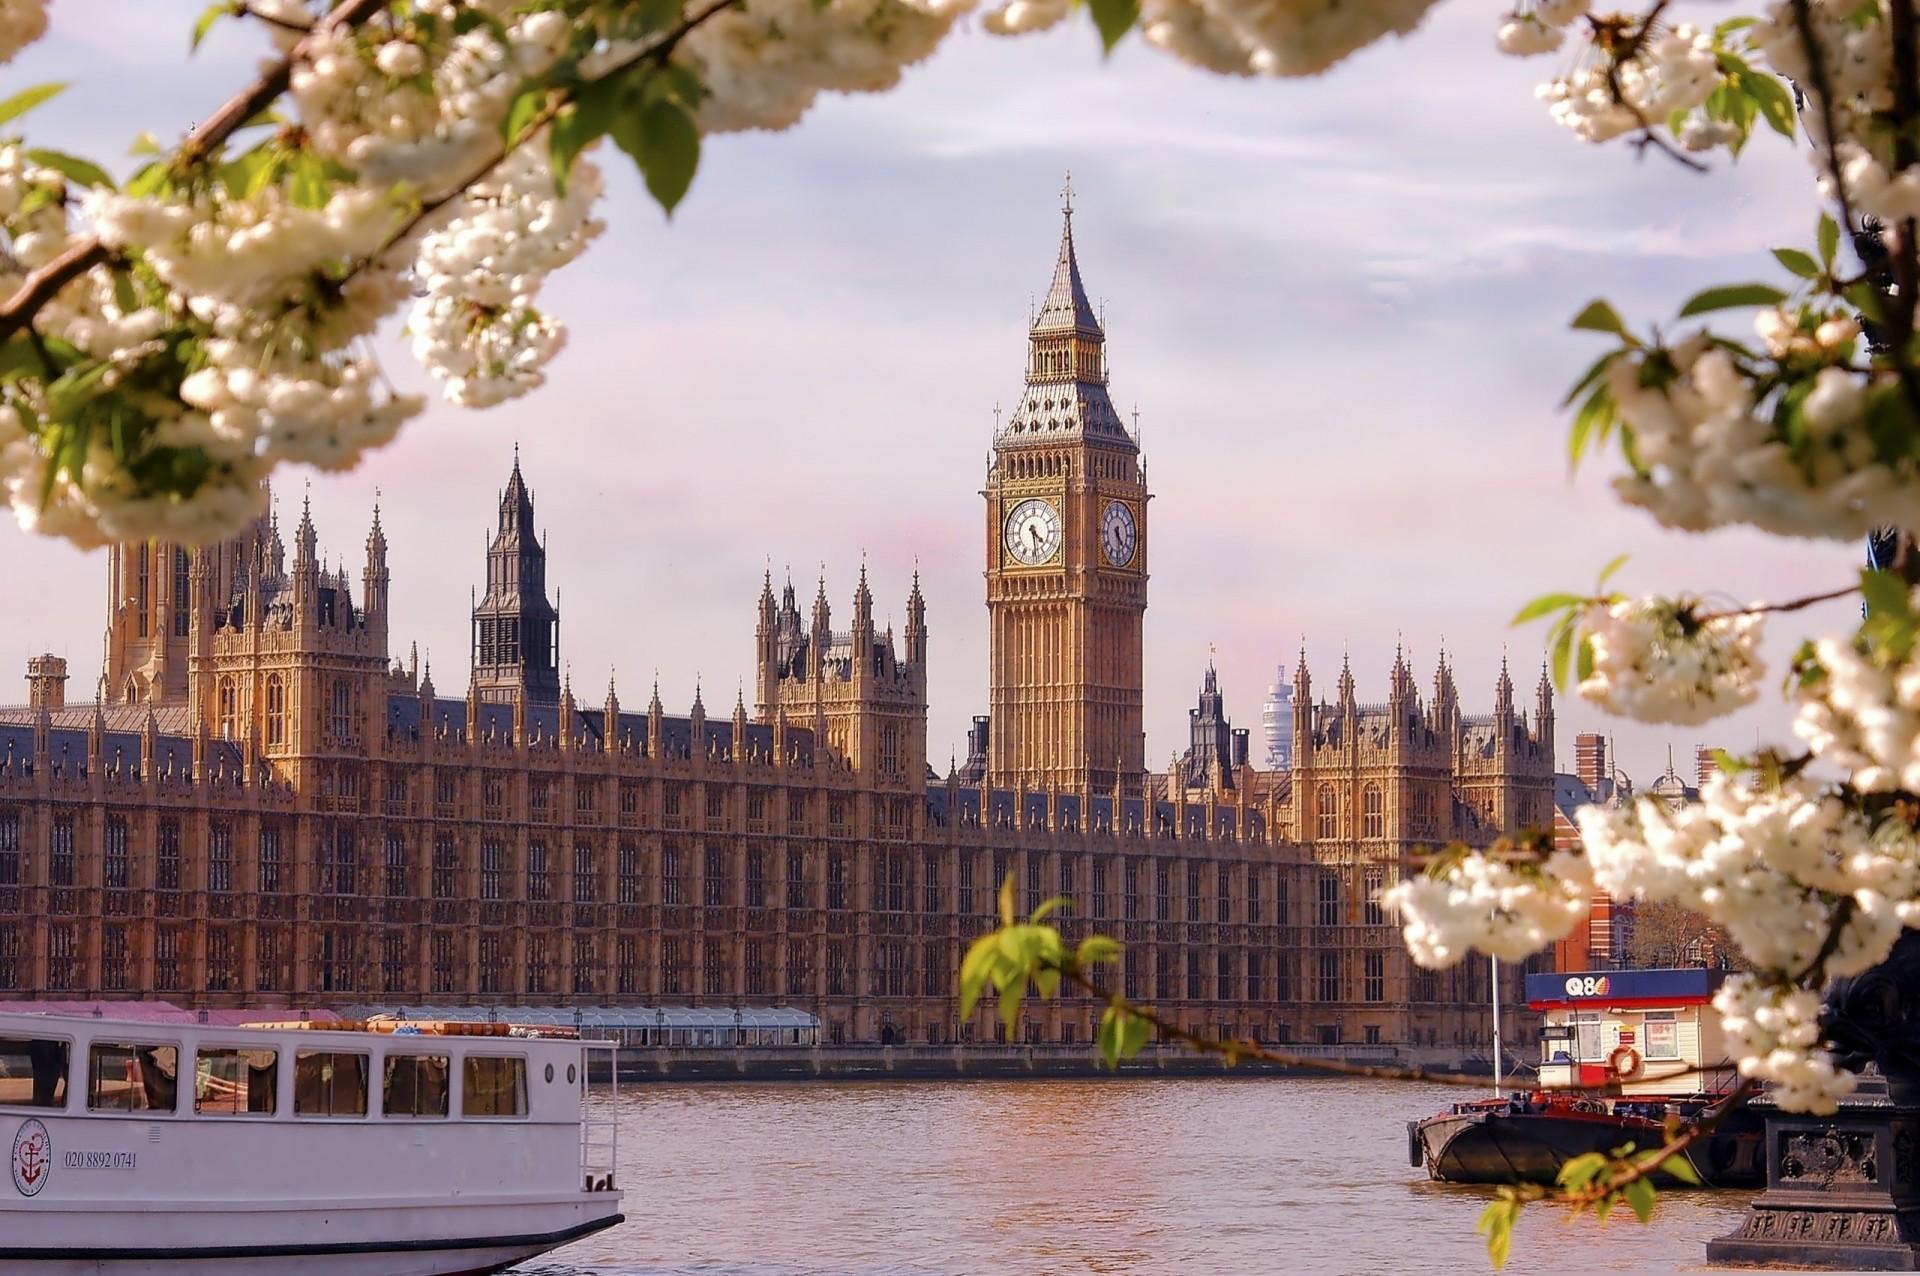 город лондон фото гнущегося пластика позволяют